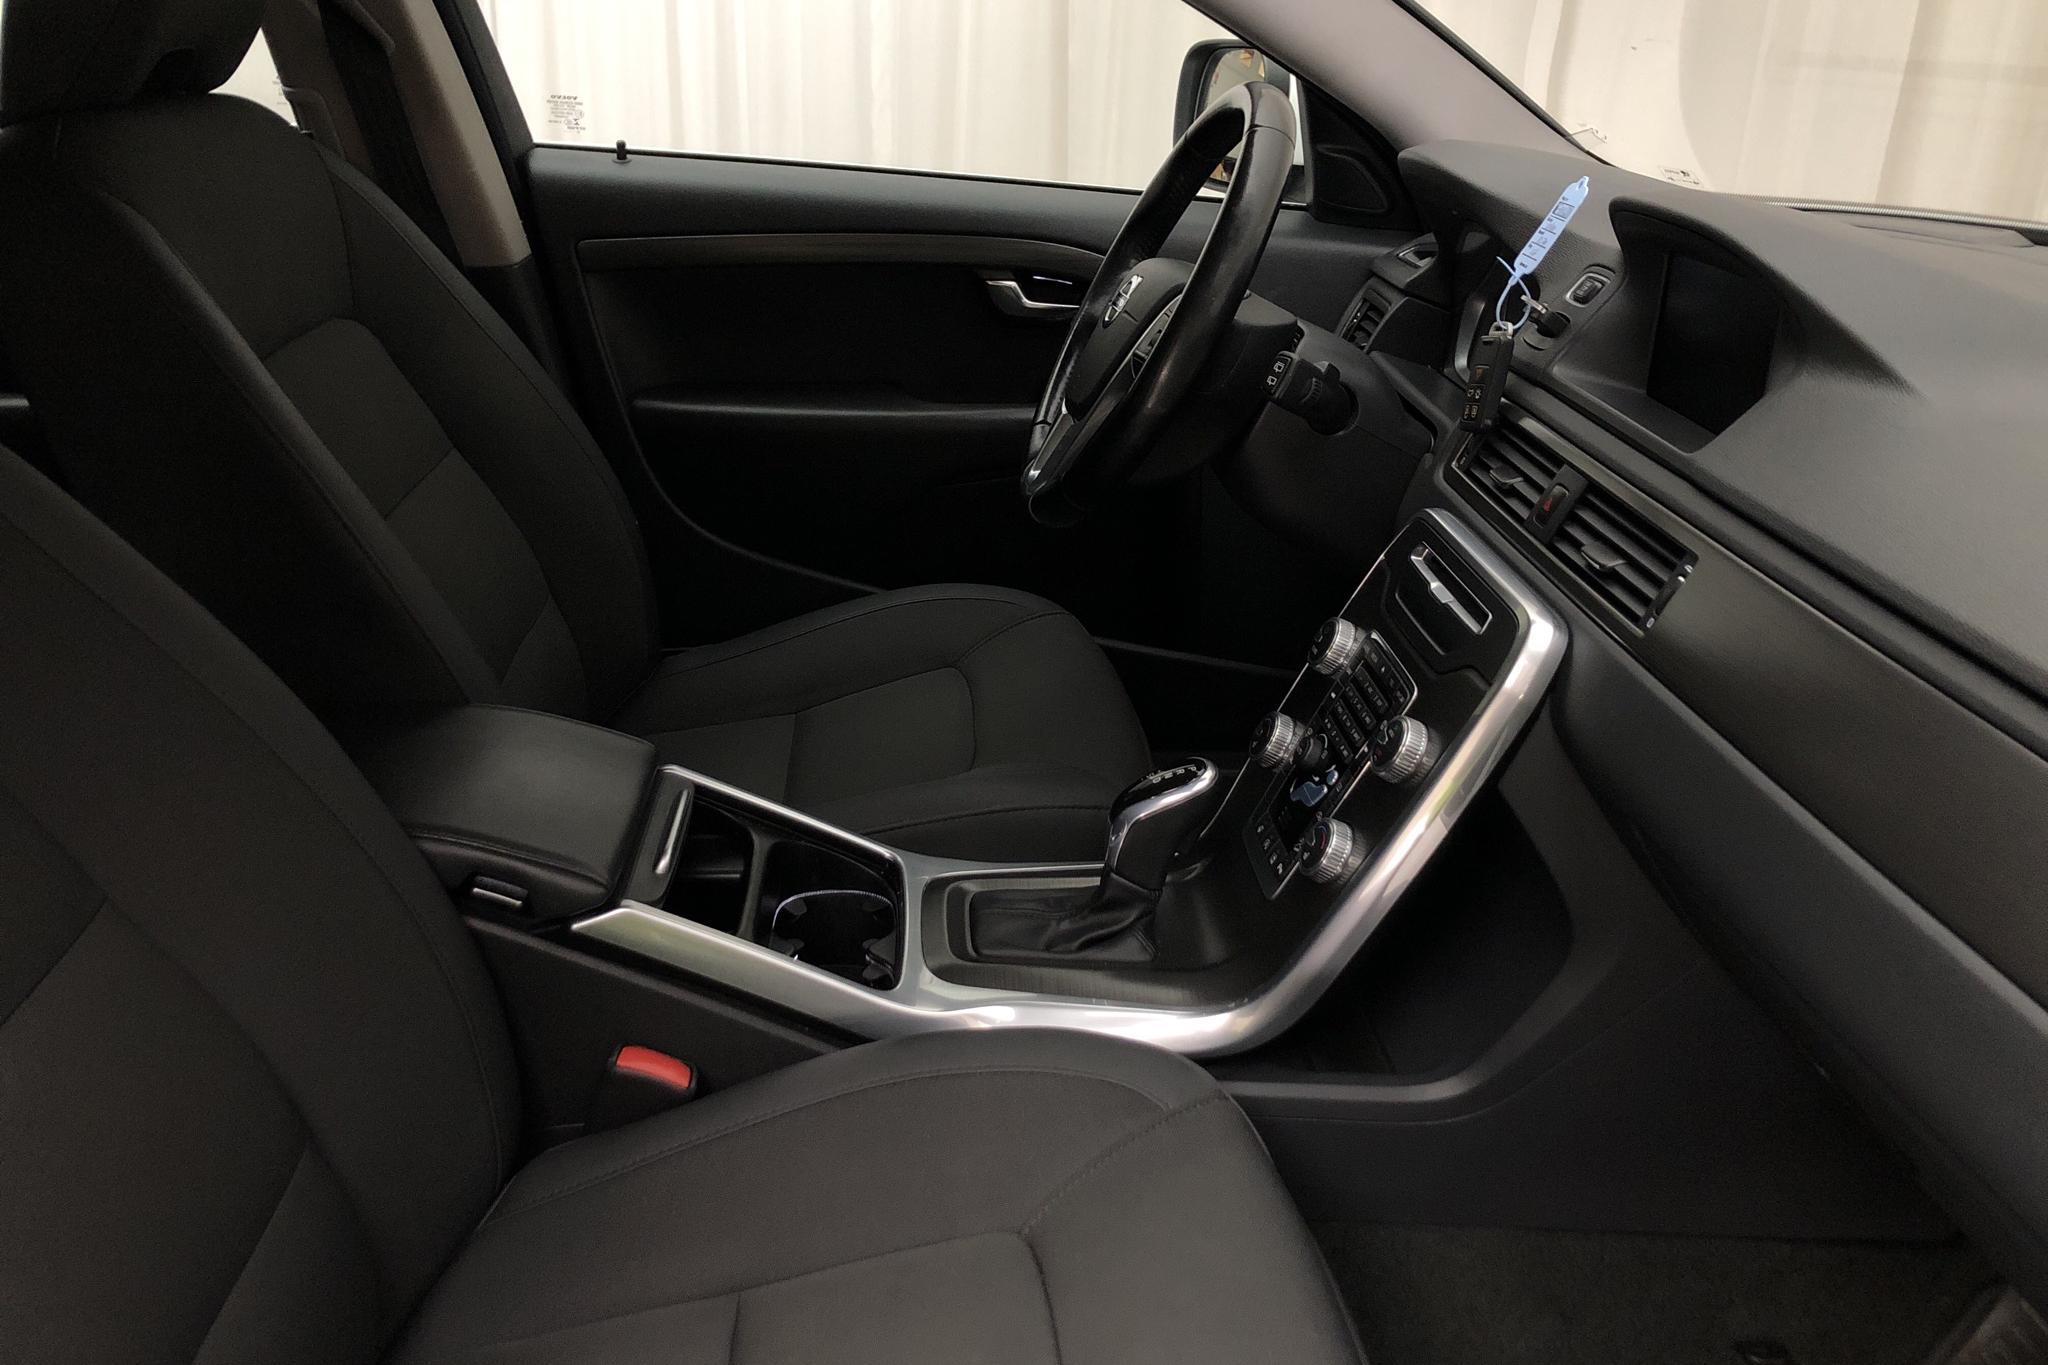 Volvo XC70 II D4 AWD (181hk) - 86 900 km - Automatic - white - 2016